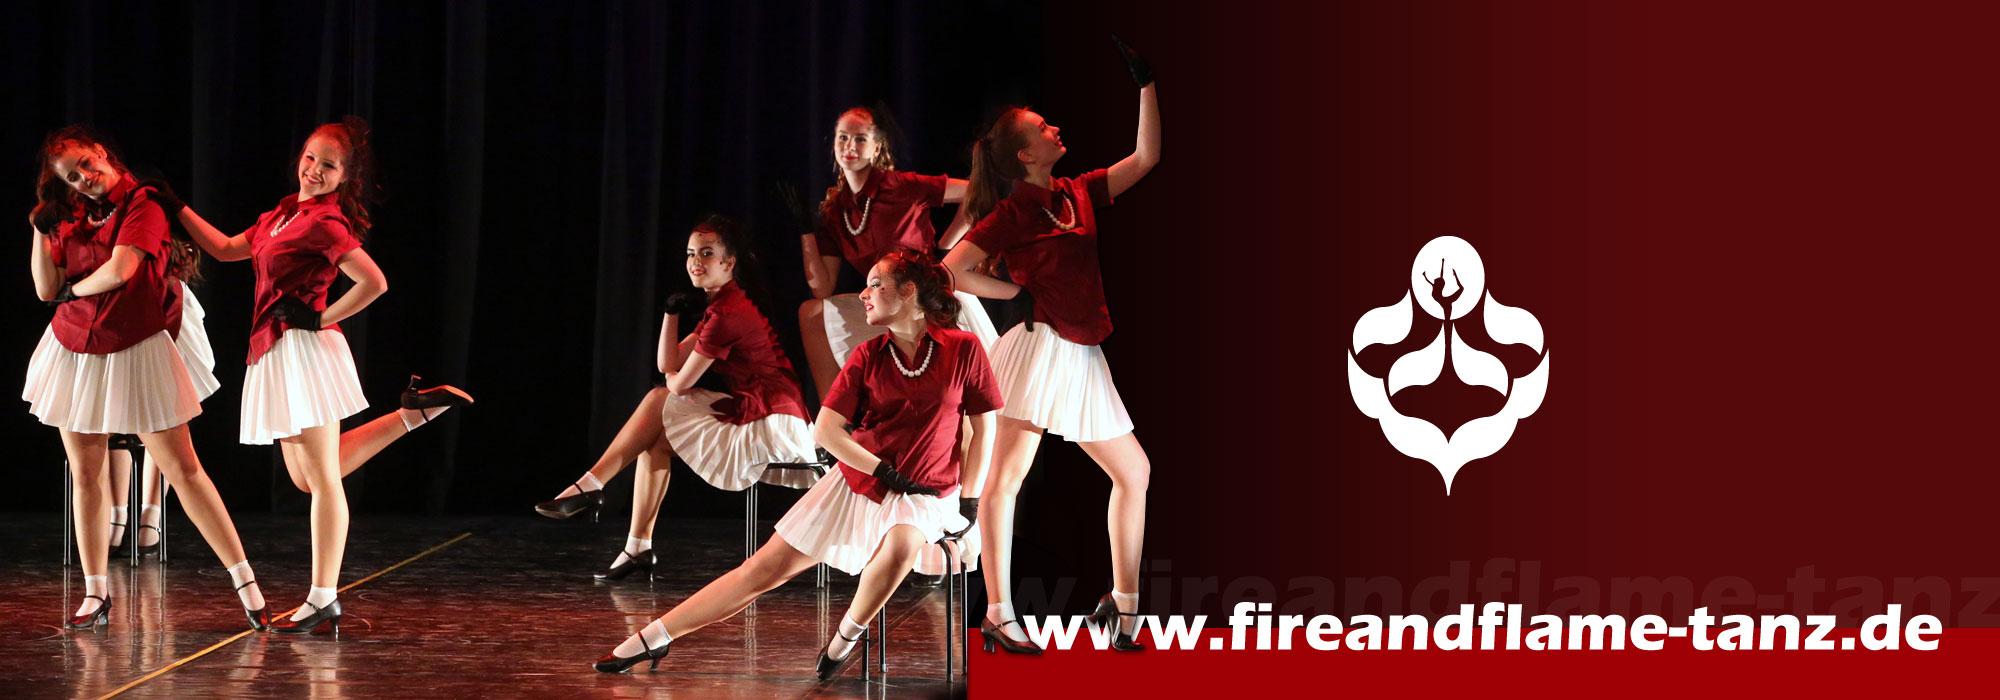 fire & flame tanzensemble eisenhüttenstadt eko